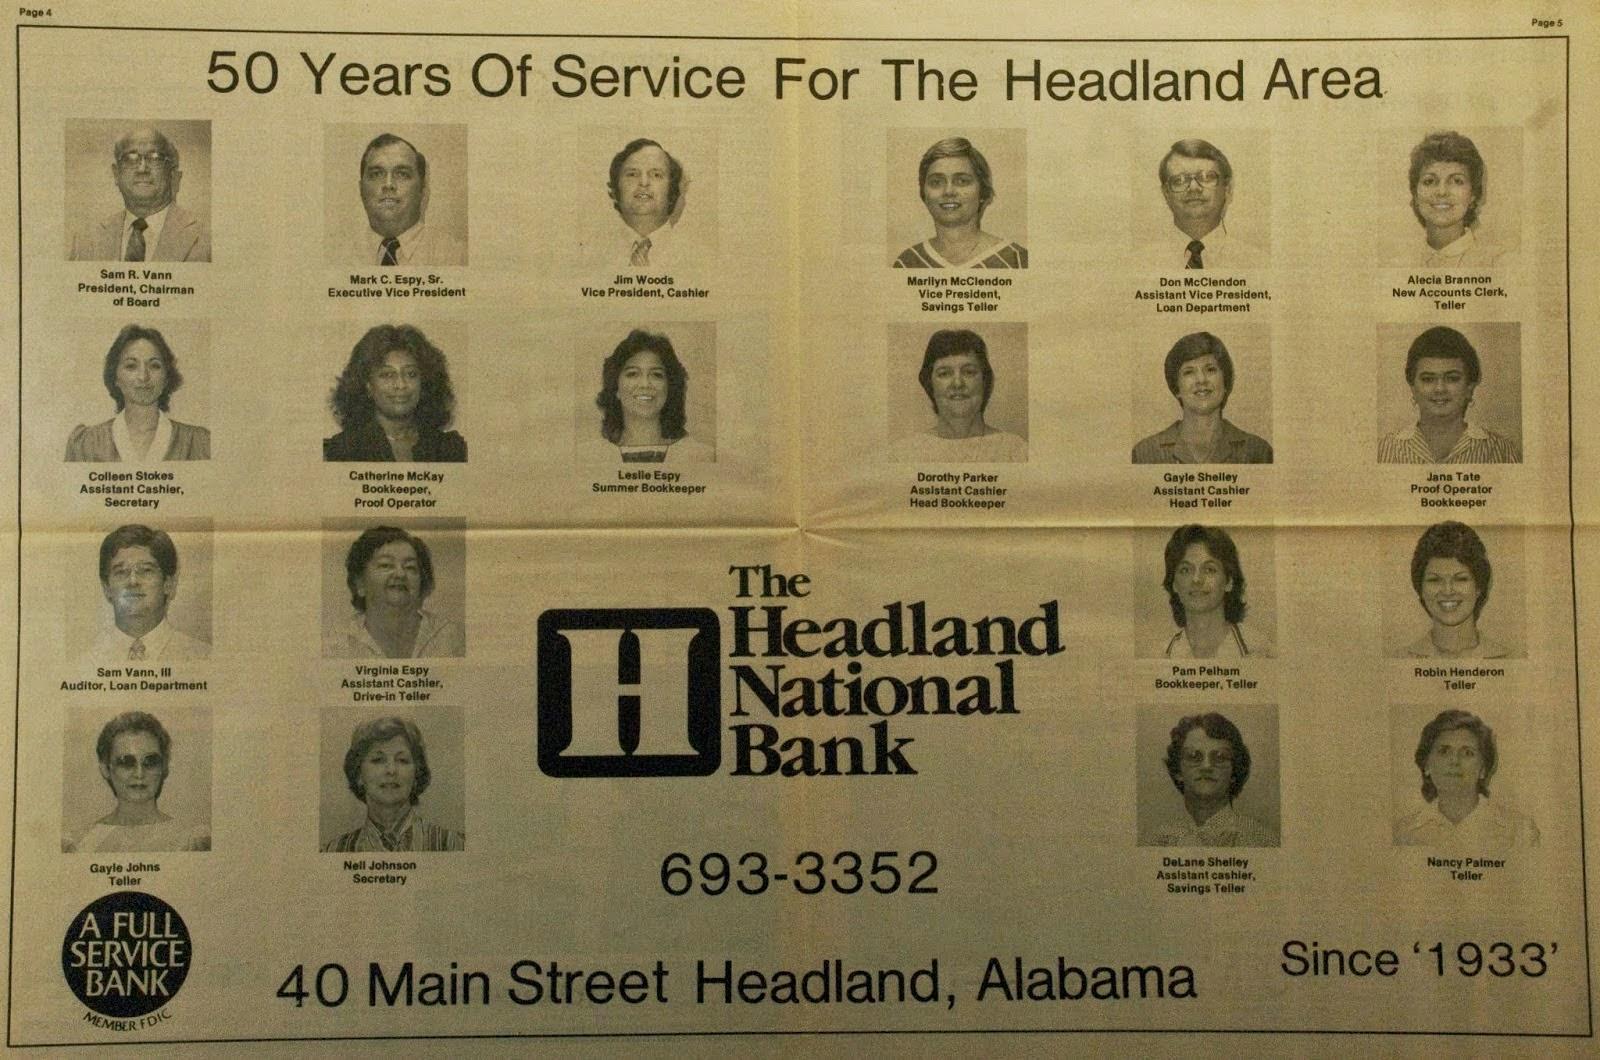 Headland National Bank turns 50